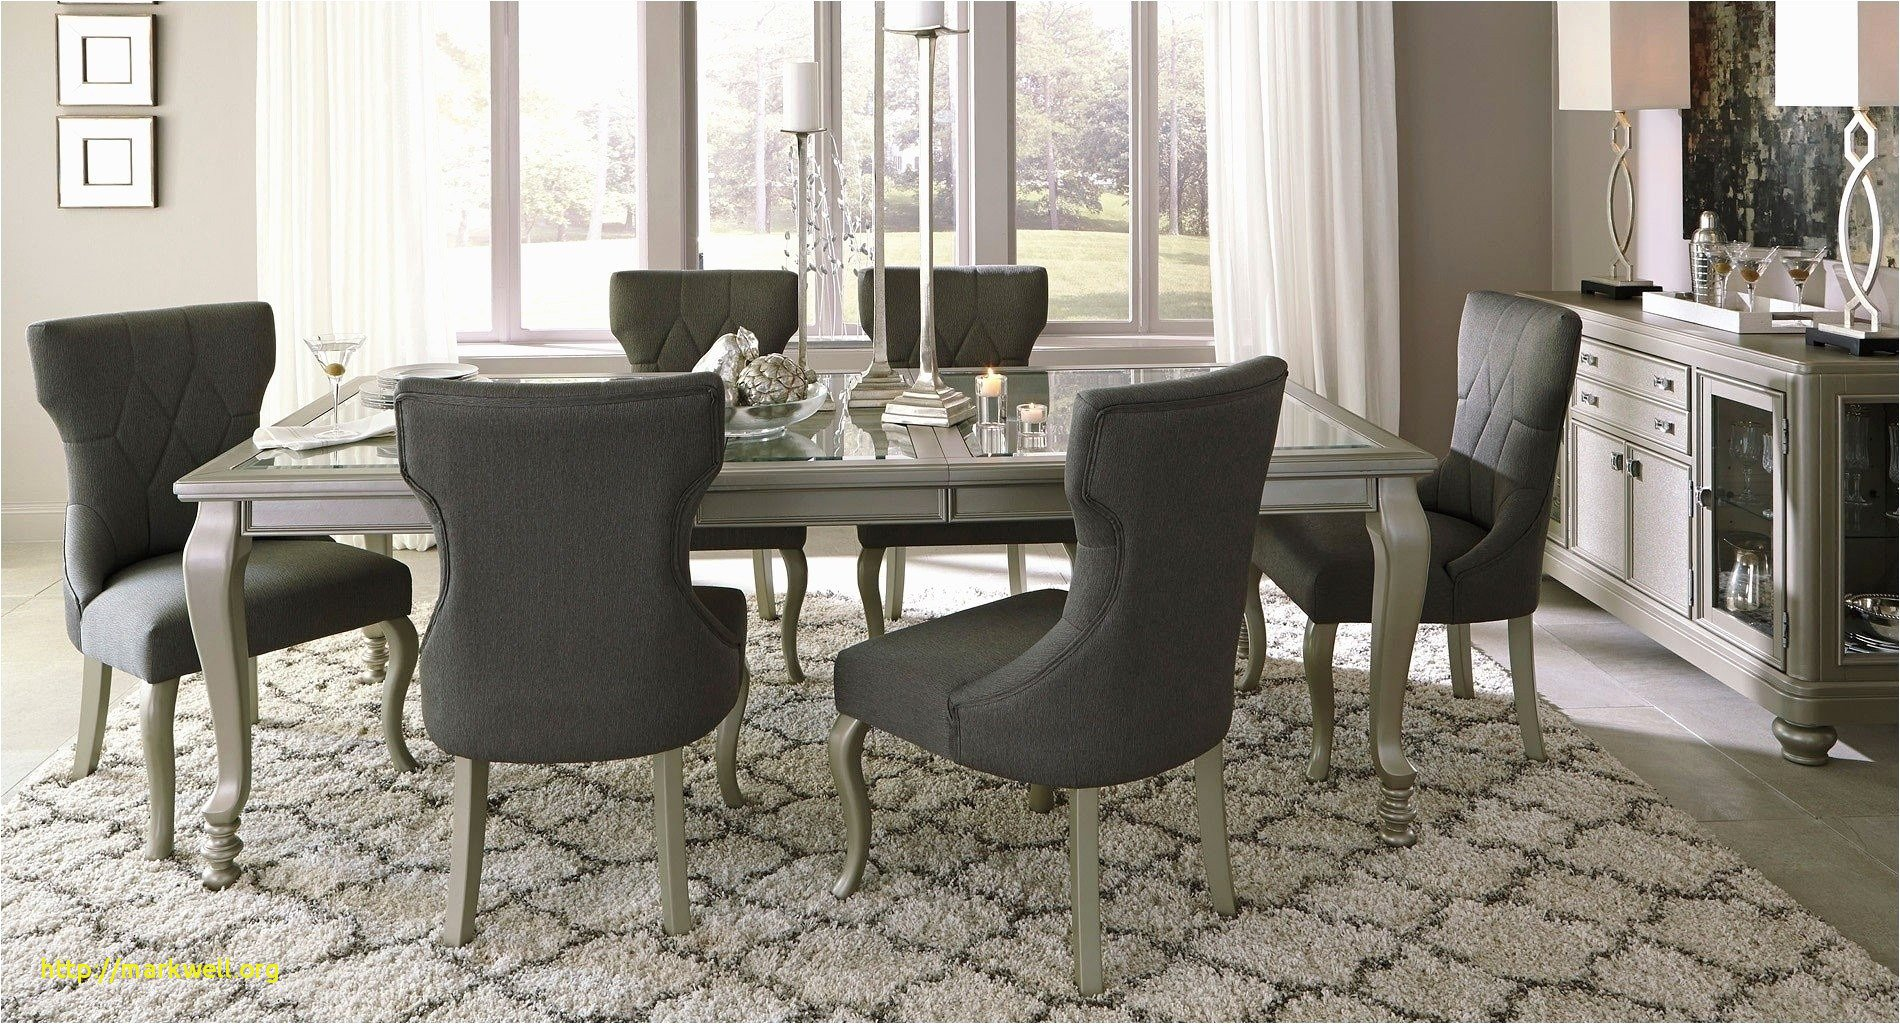 Bedroom Dressers On Sale Elegant Luxury Side Chairs for Bedroom